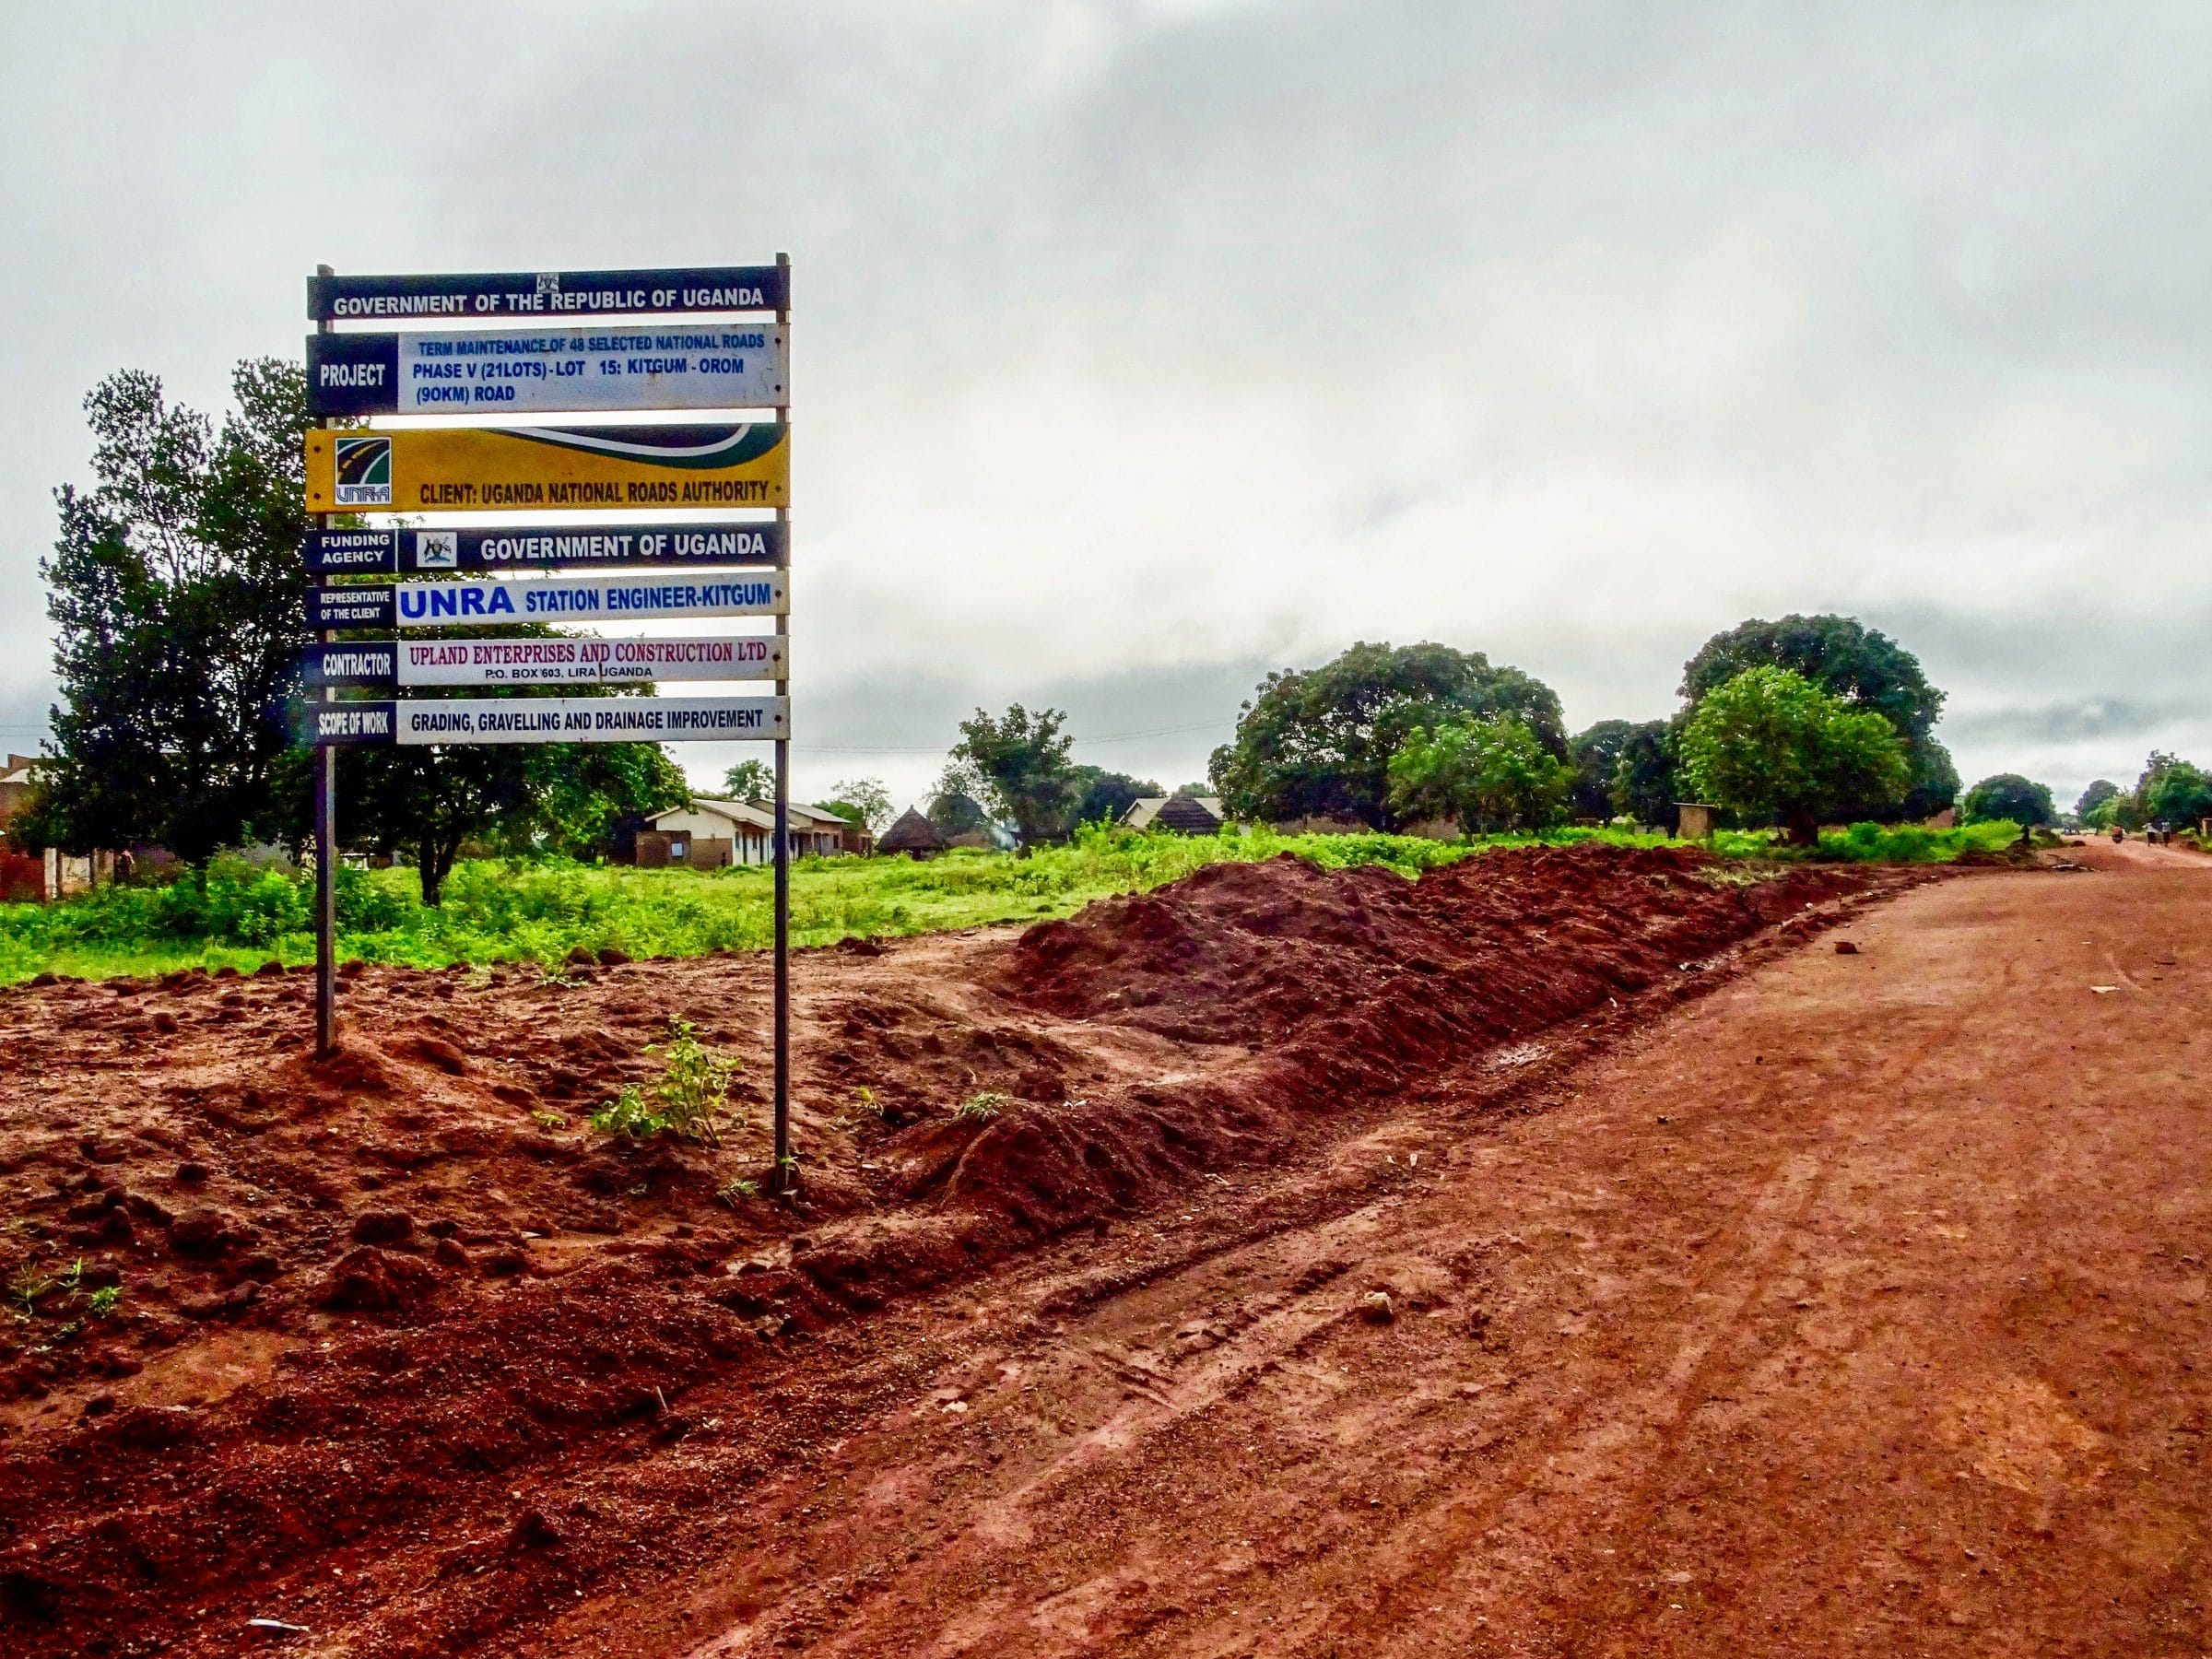 Wegwerkzaamheden op het 90 km lange traject Kitgum - Orom